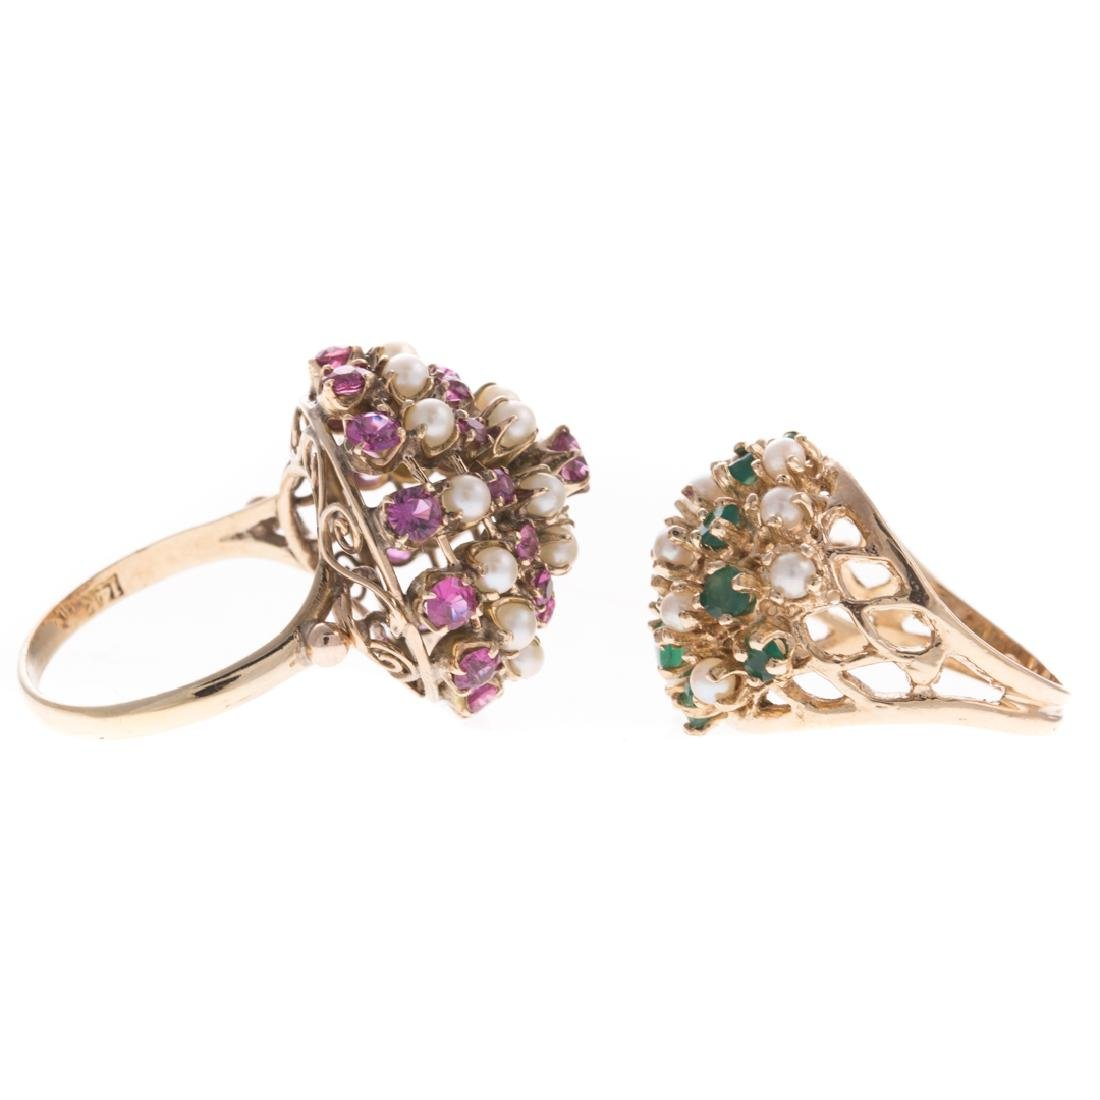 A Pair of Lady's Pearl & Gemstone Cluster Rings - 2